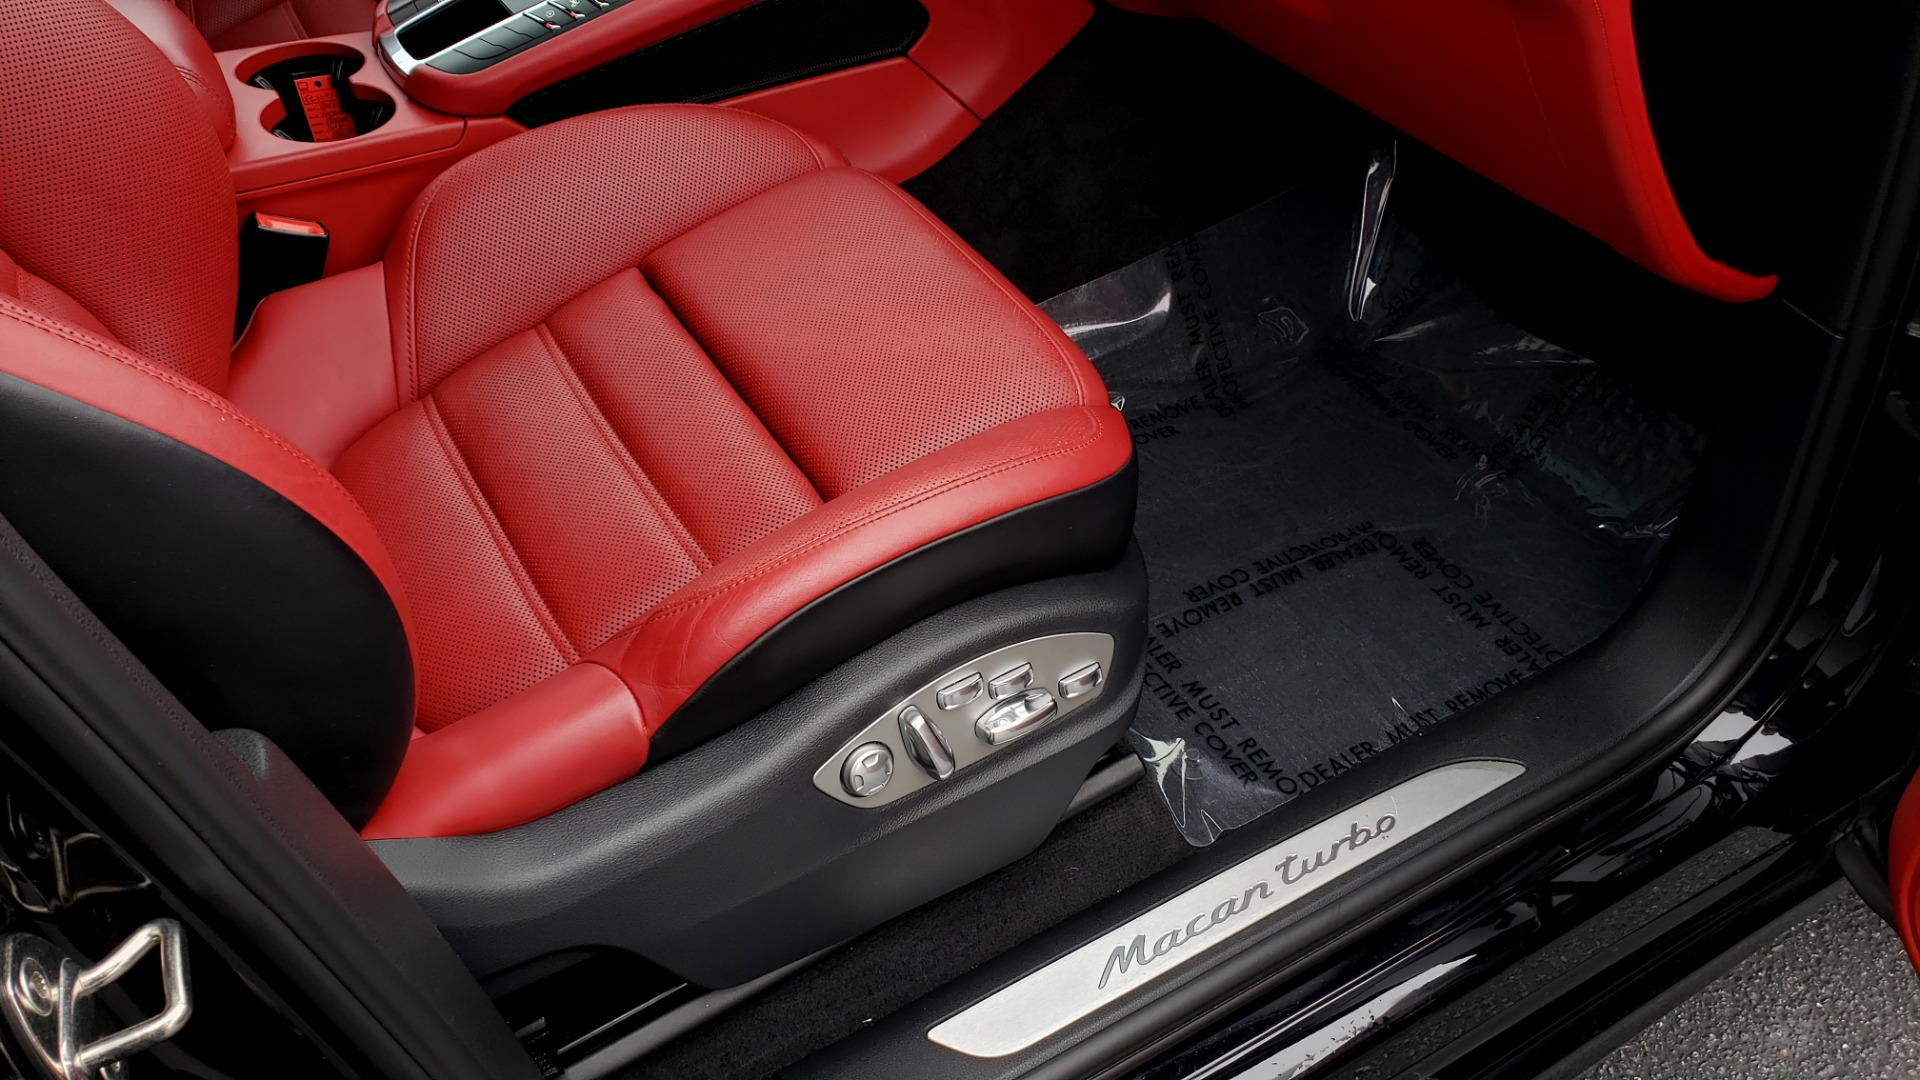 Used 2016 Porsche MACAN TURBO / PREM / NAV / PARK ASST / BOSE / PDK / CHRONO PKG for sale Sold at Formula Imports in Charlotte NC 28227 70